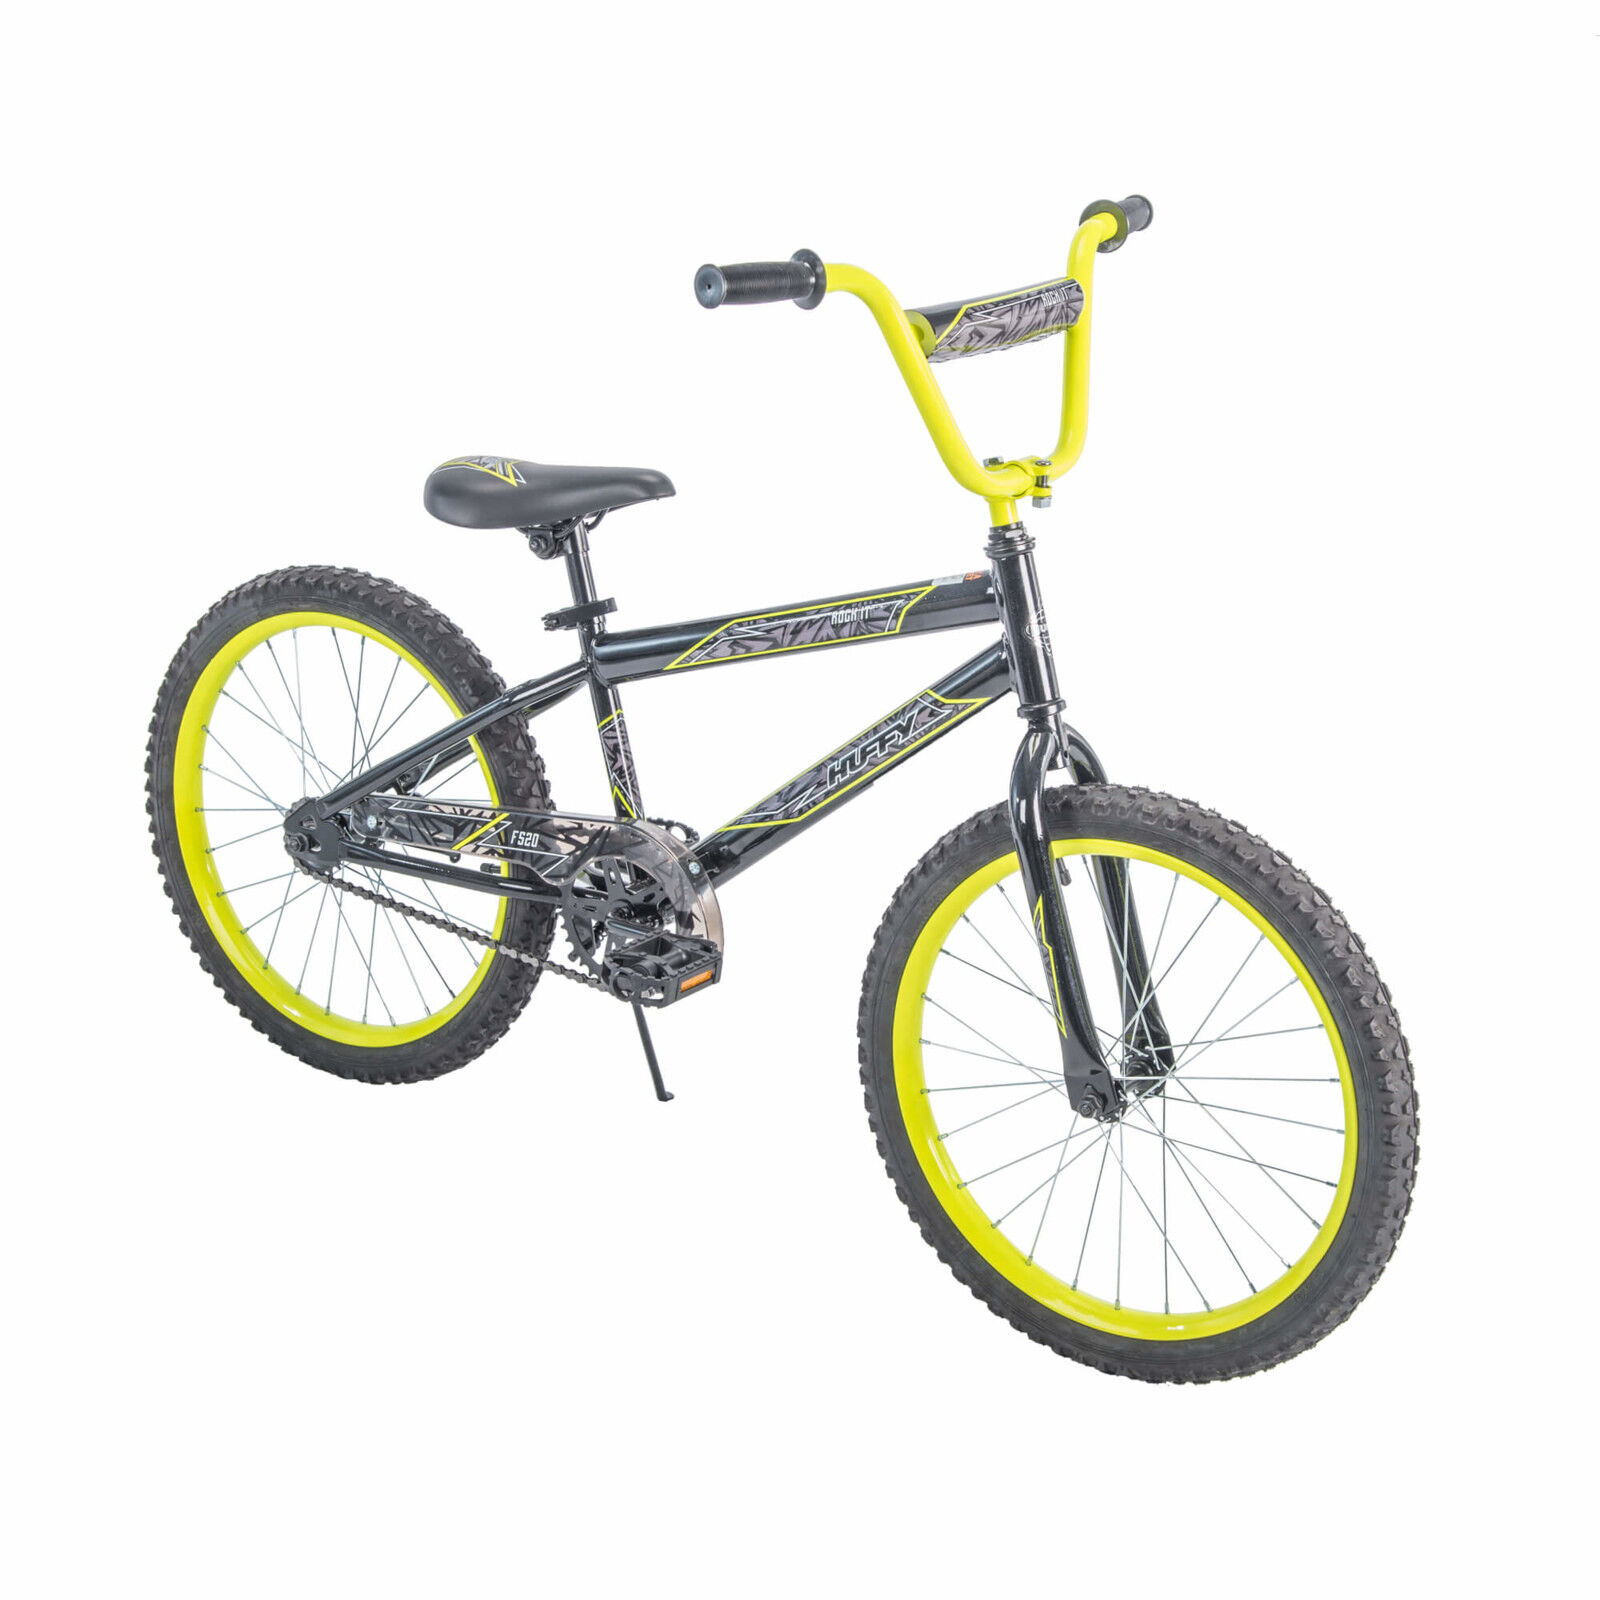 4df7146e6aa Rock It Boys' Bike Metallic Black with Neon Yellow Accents 20